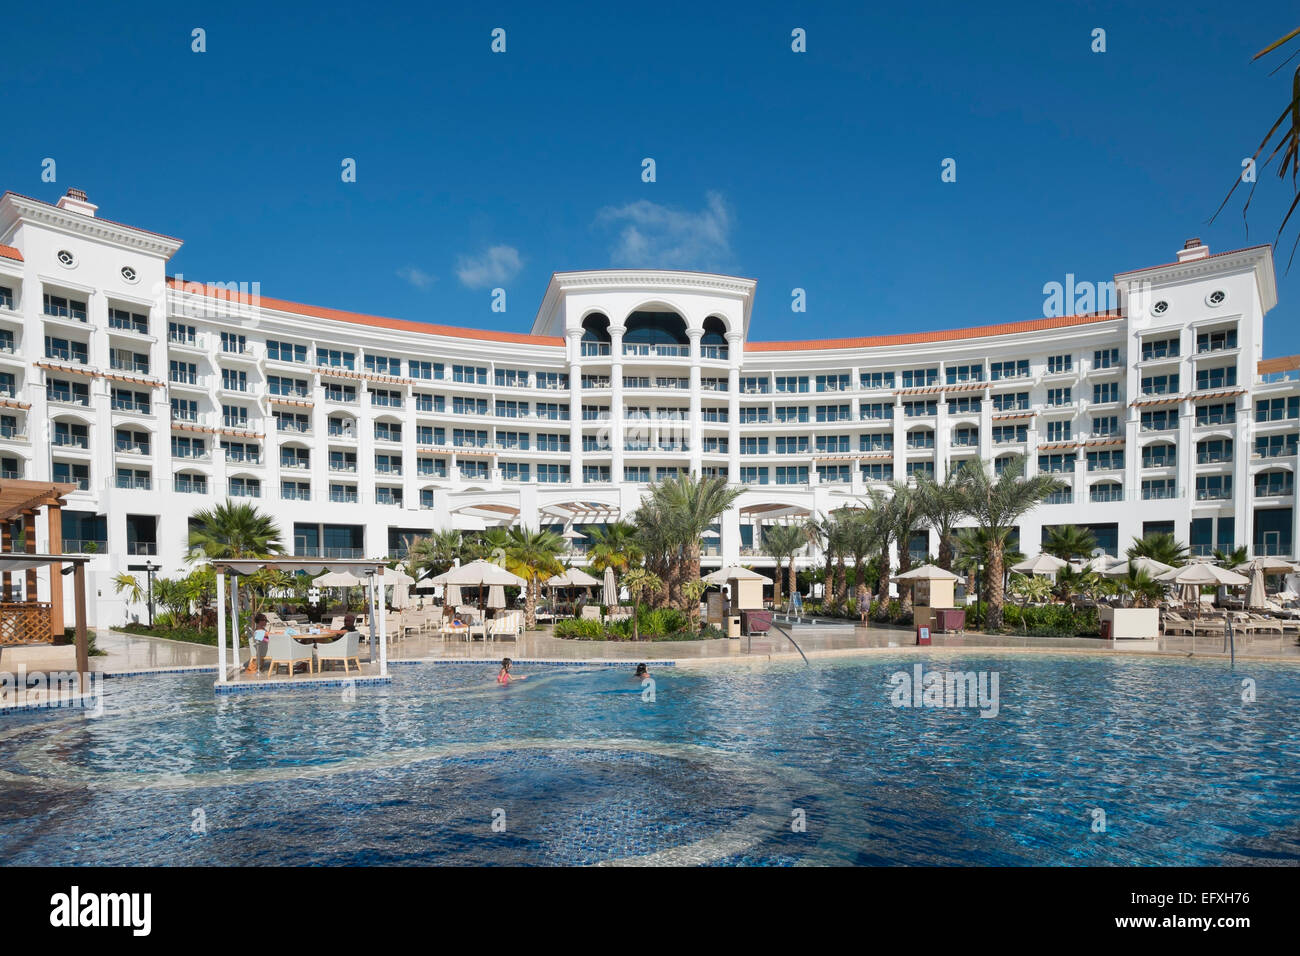 Waldorf Astoria Hotel On The Palm Jumeirah Island In Dubai United